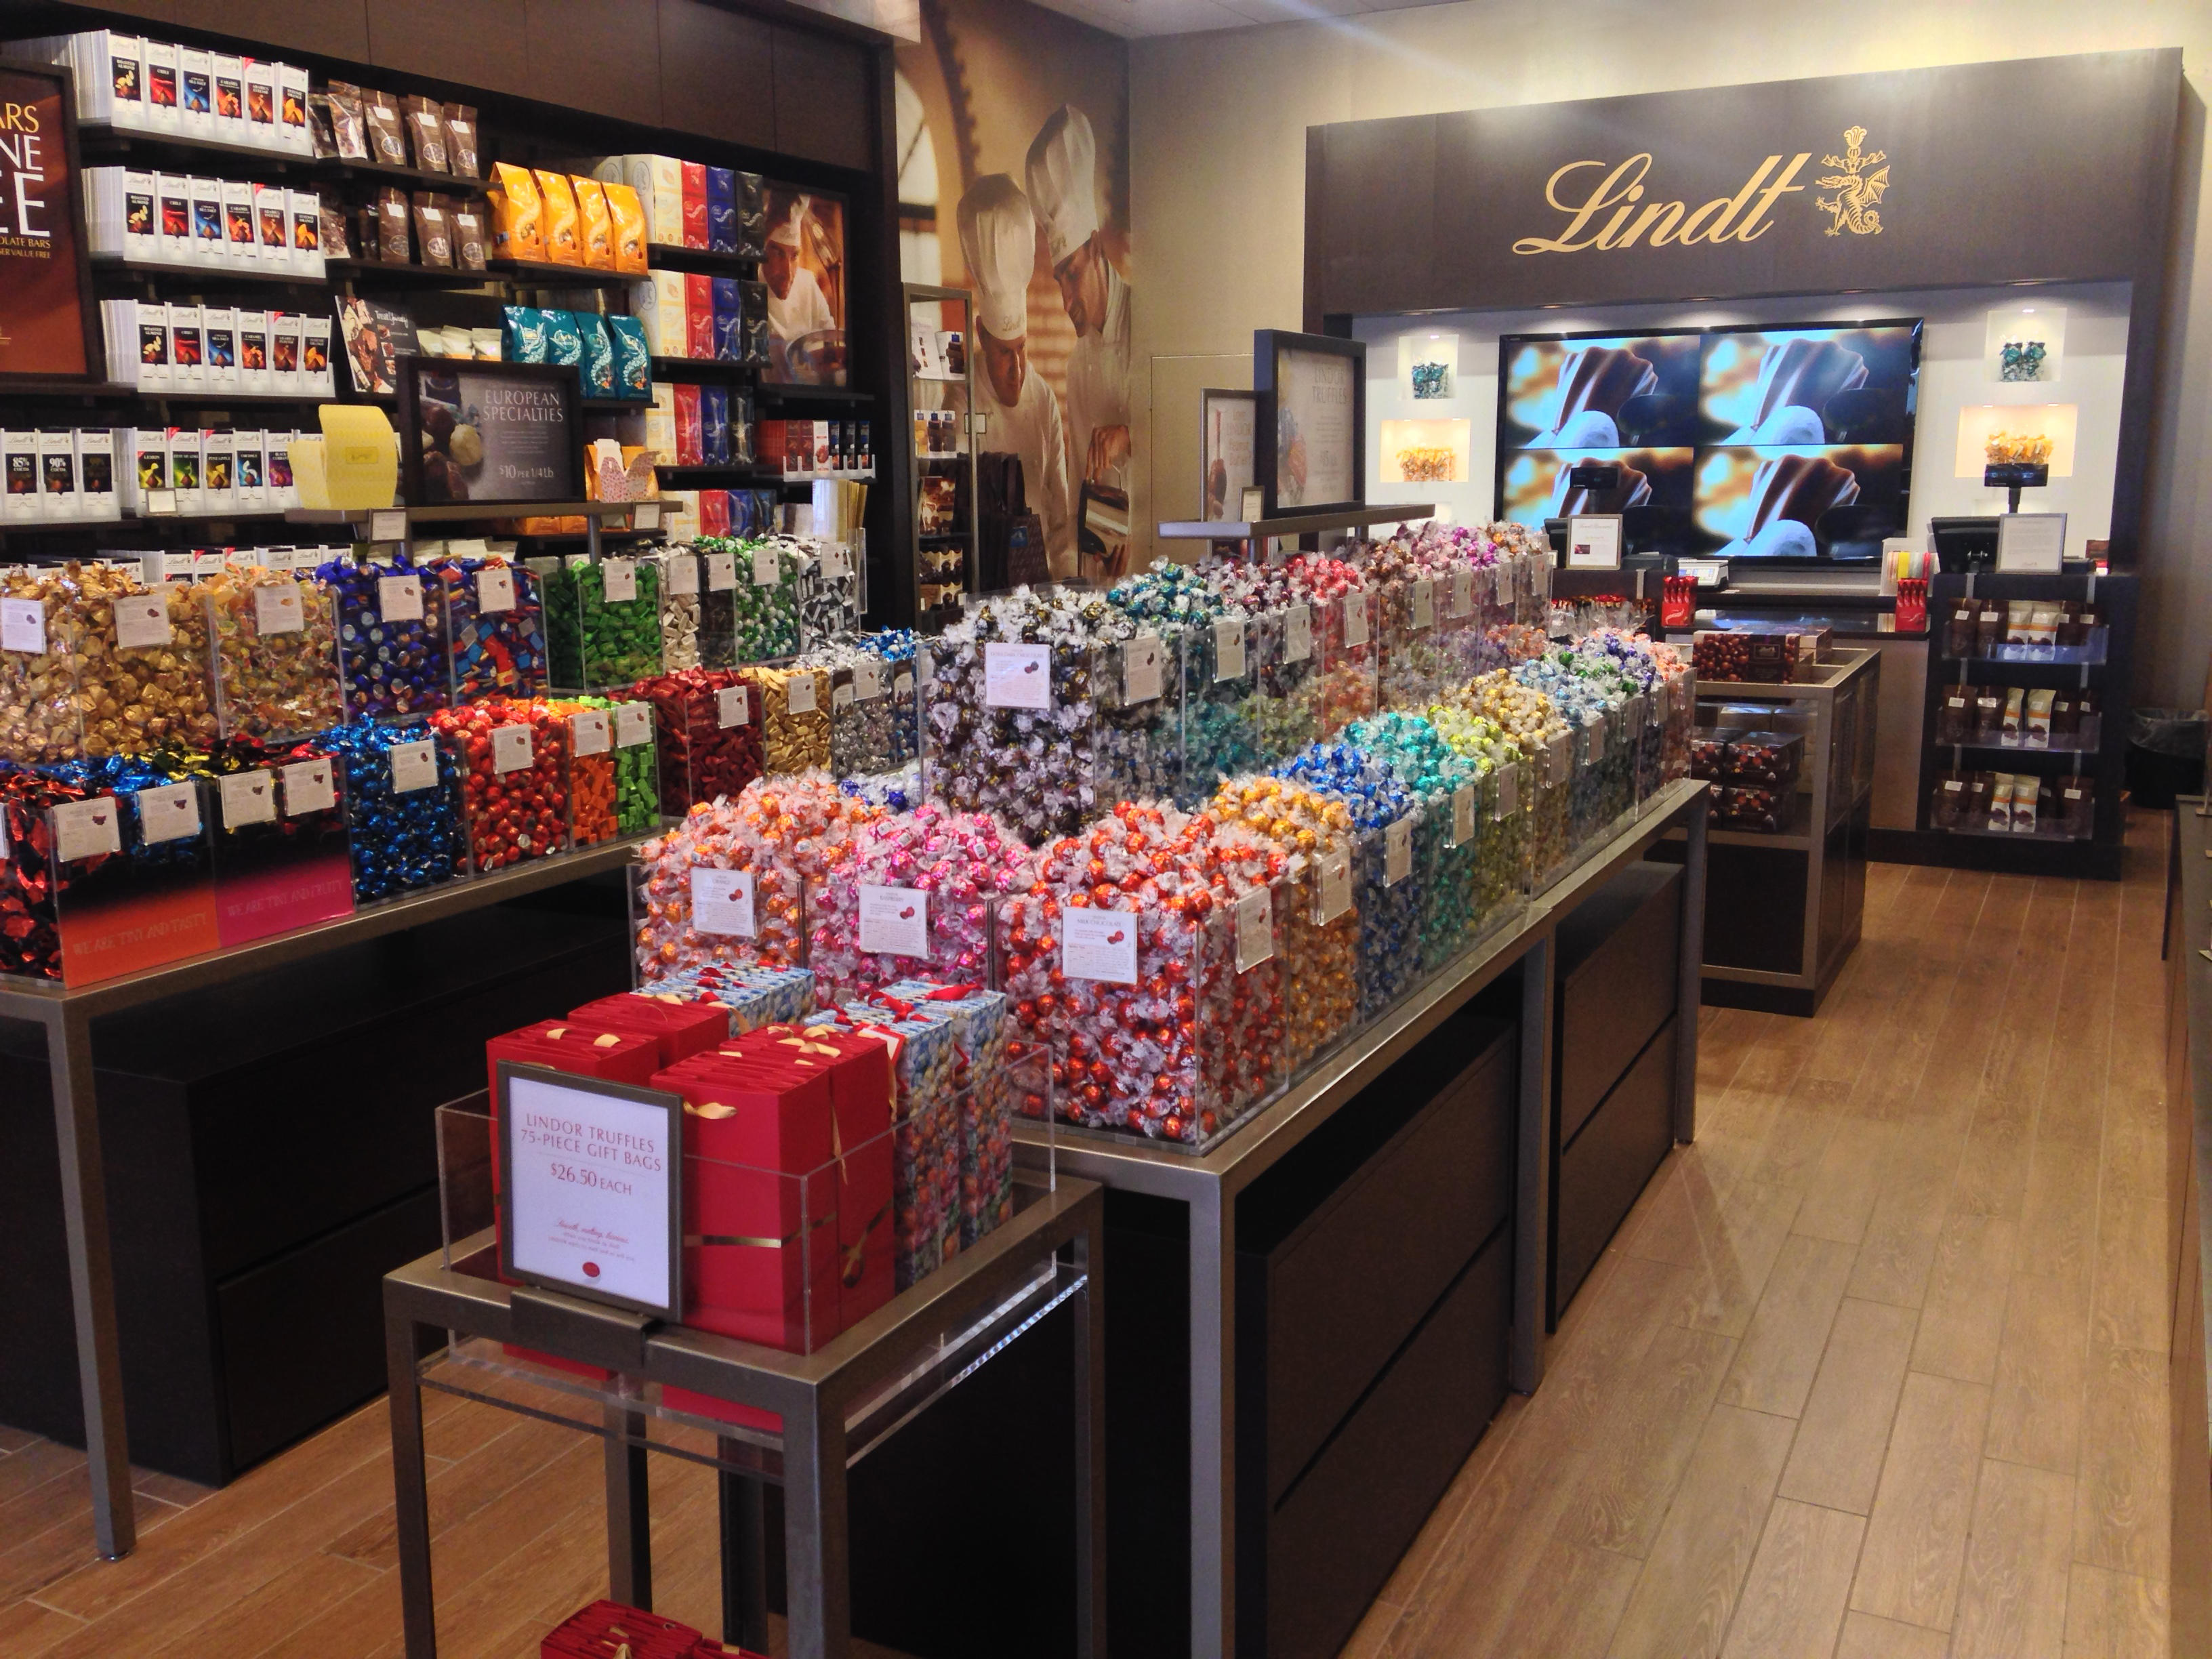 Lindt Chocolate Shop image 1